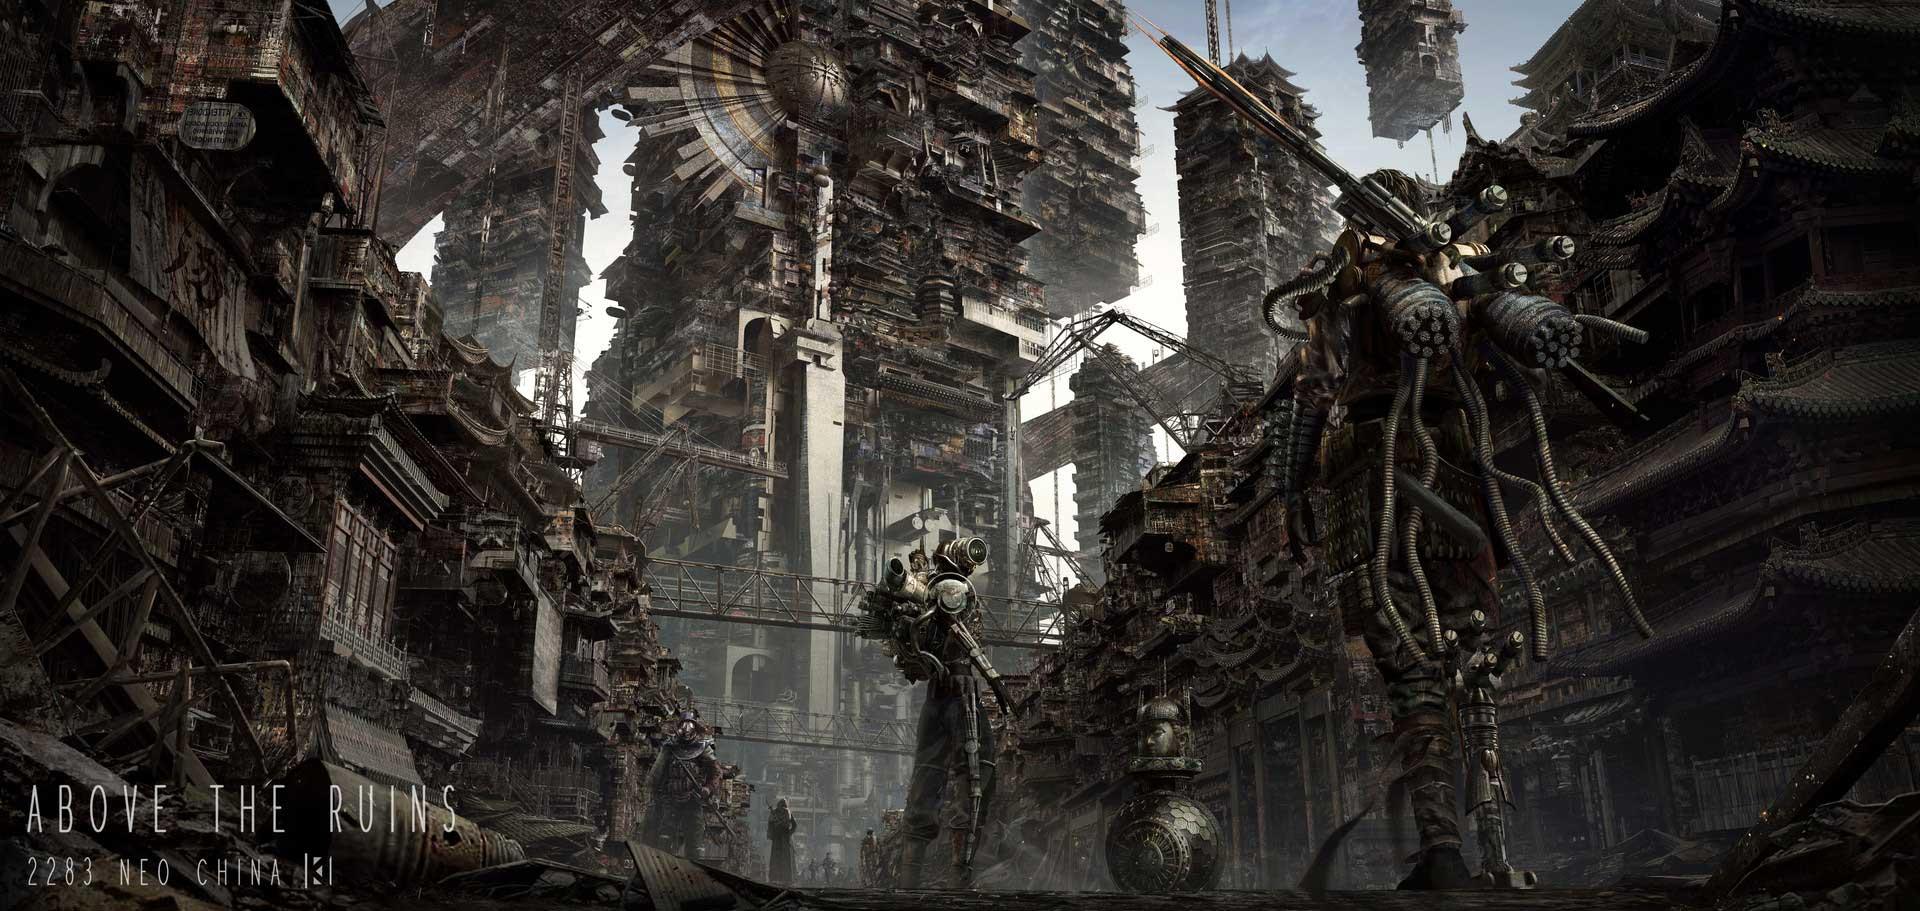 The Stunning Sci-Fi & Fantasy Art of Kuma Wu